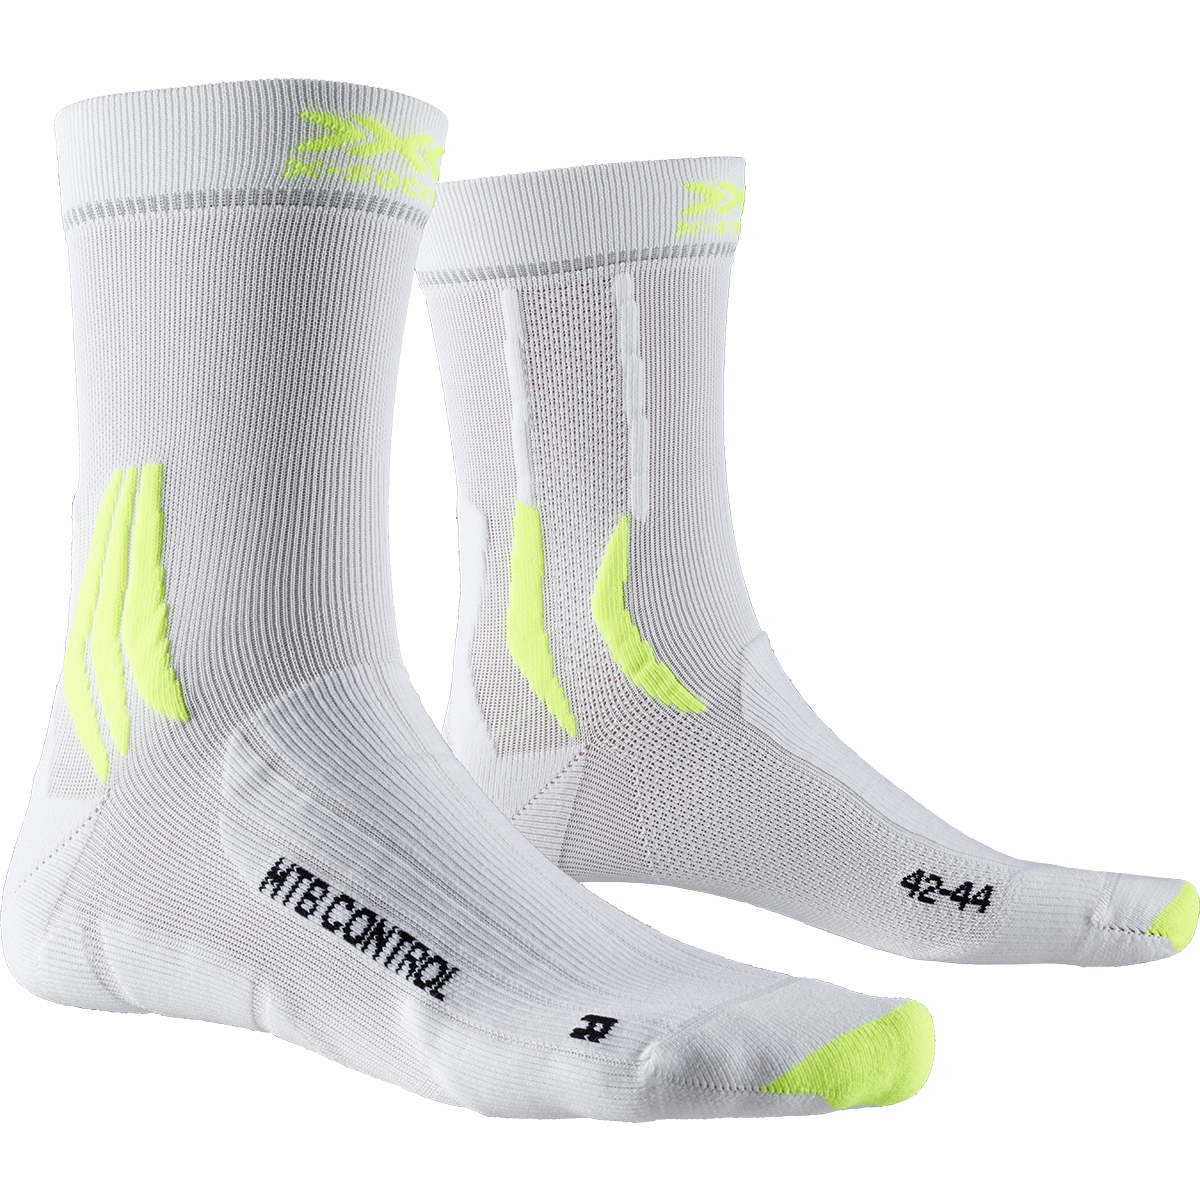 Bild von X-Socks MTB Control Socken - arctic white/phyton yellow